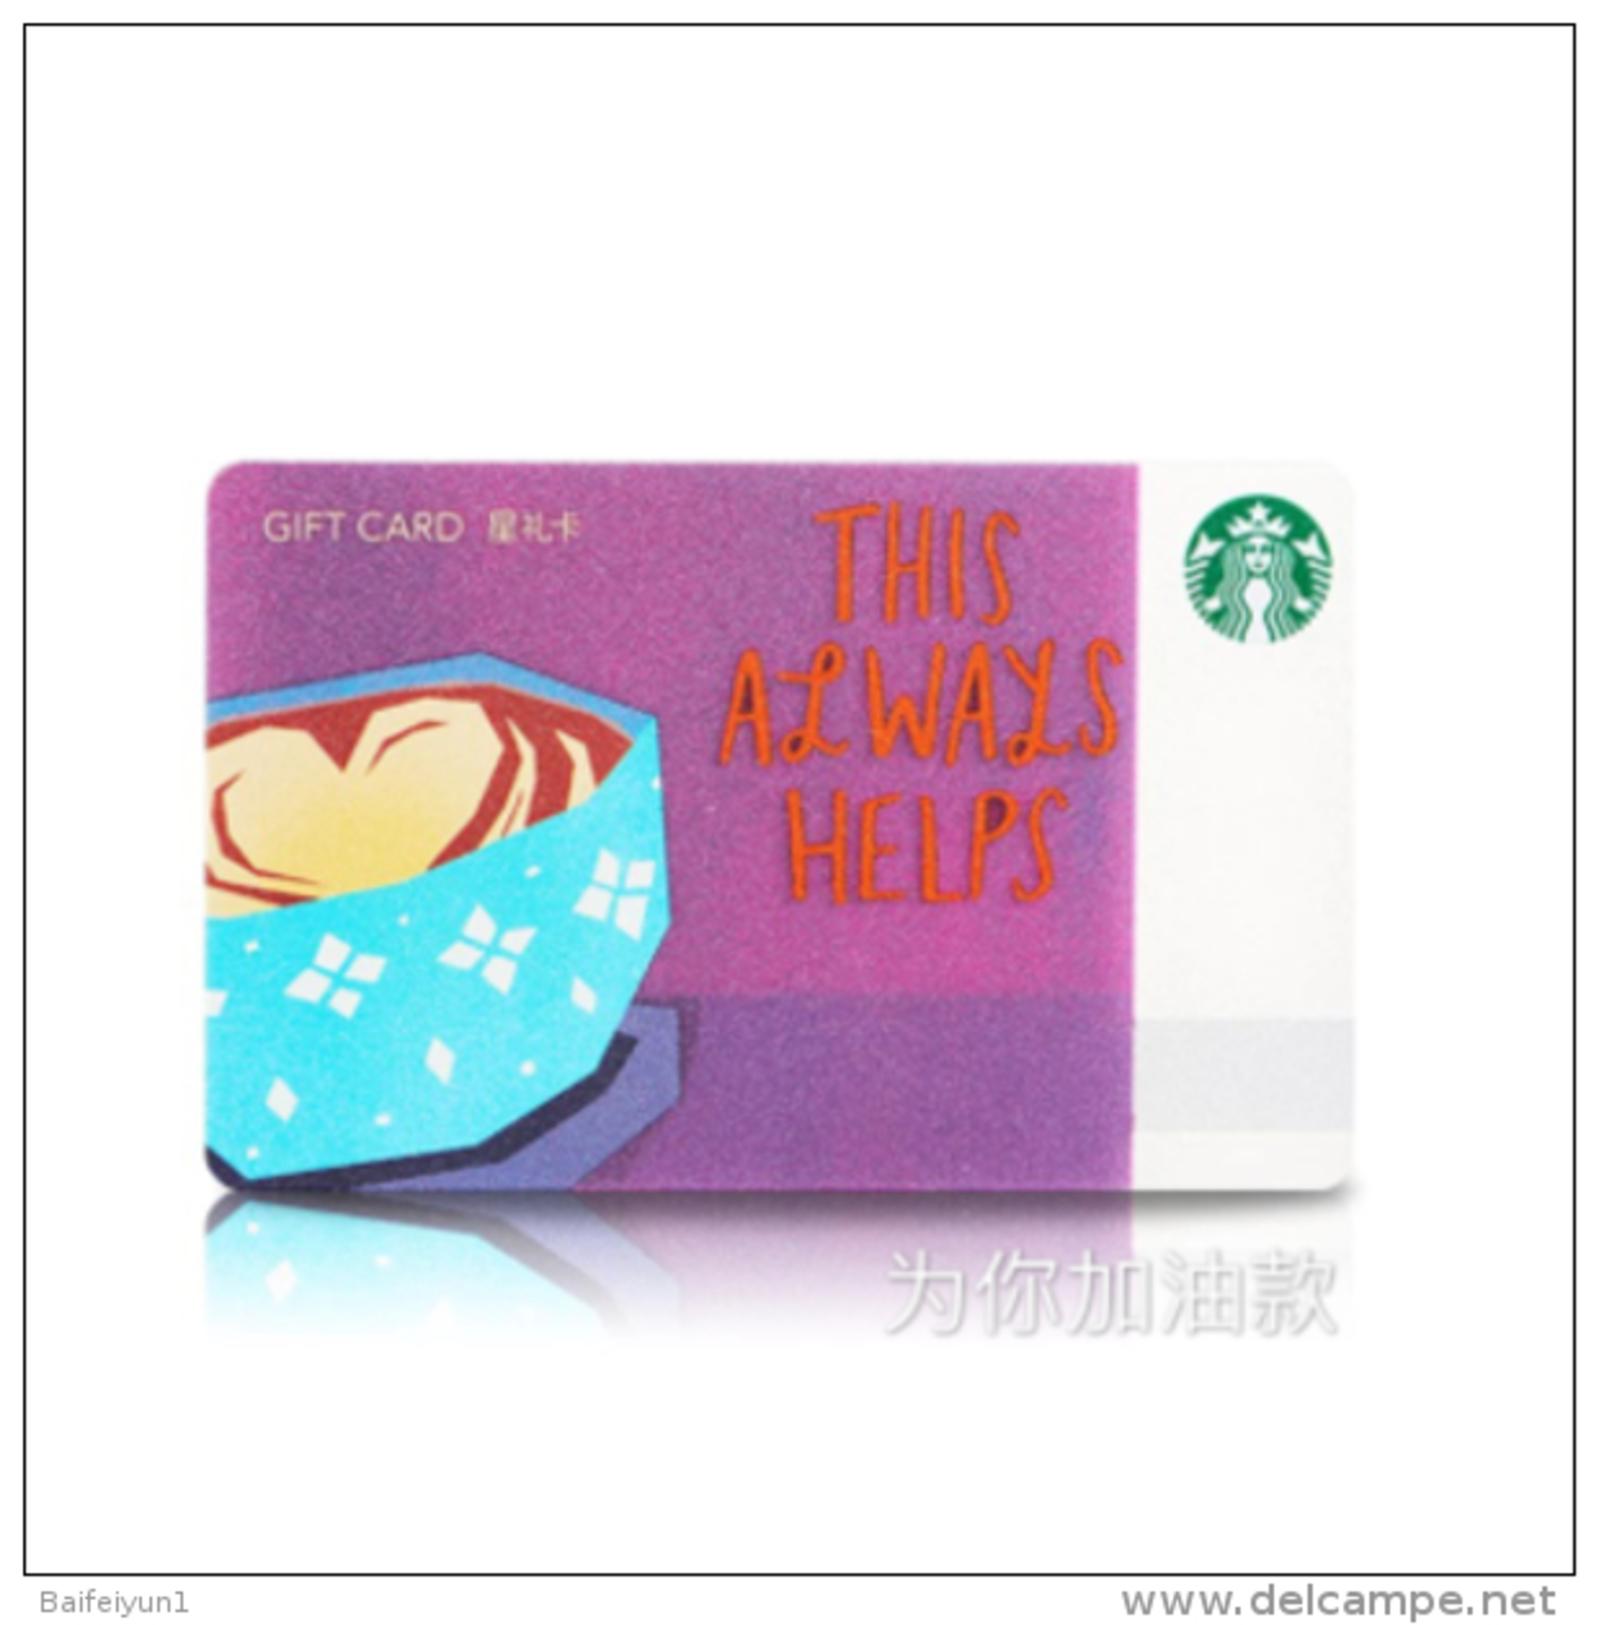 New 2016 China Starbucks This Always Helps Gift Card RMB100 - Chine